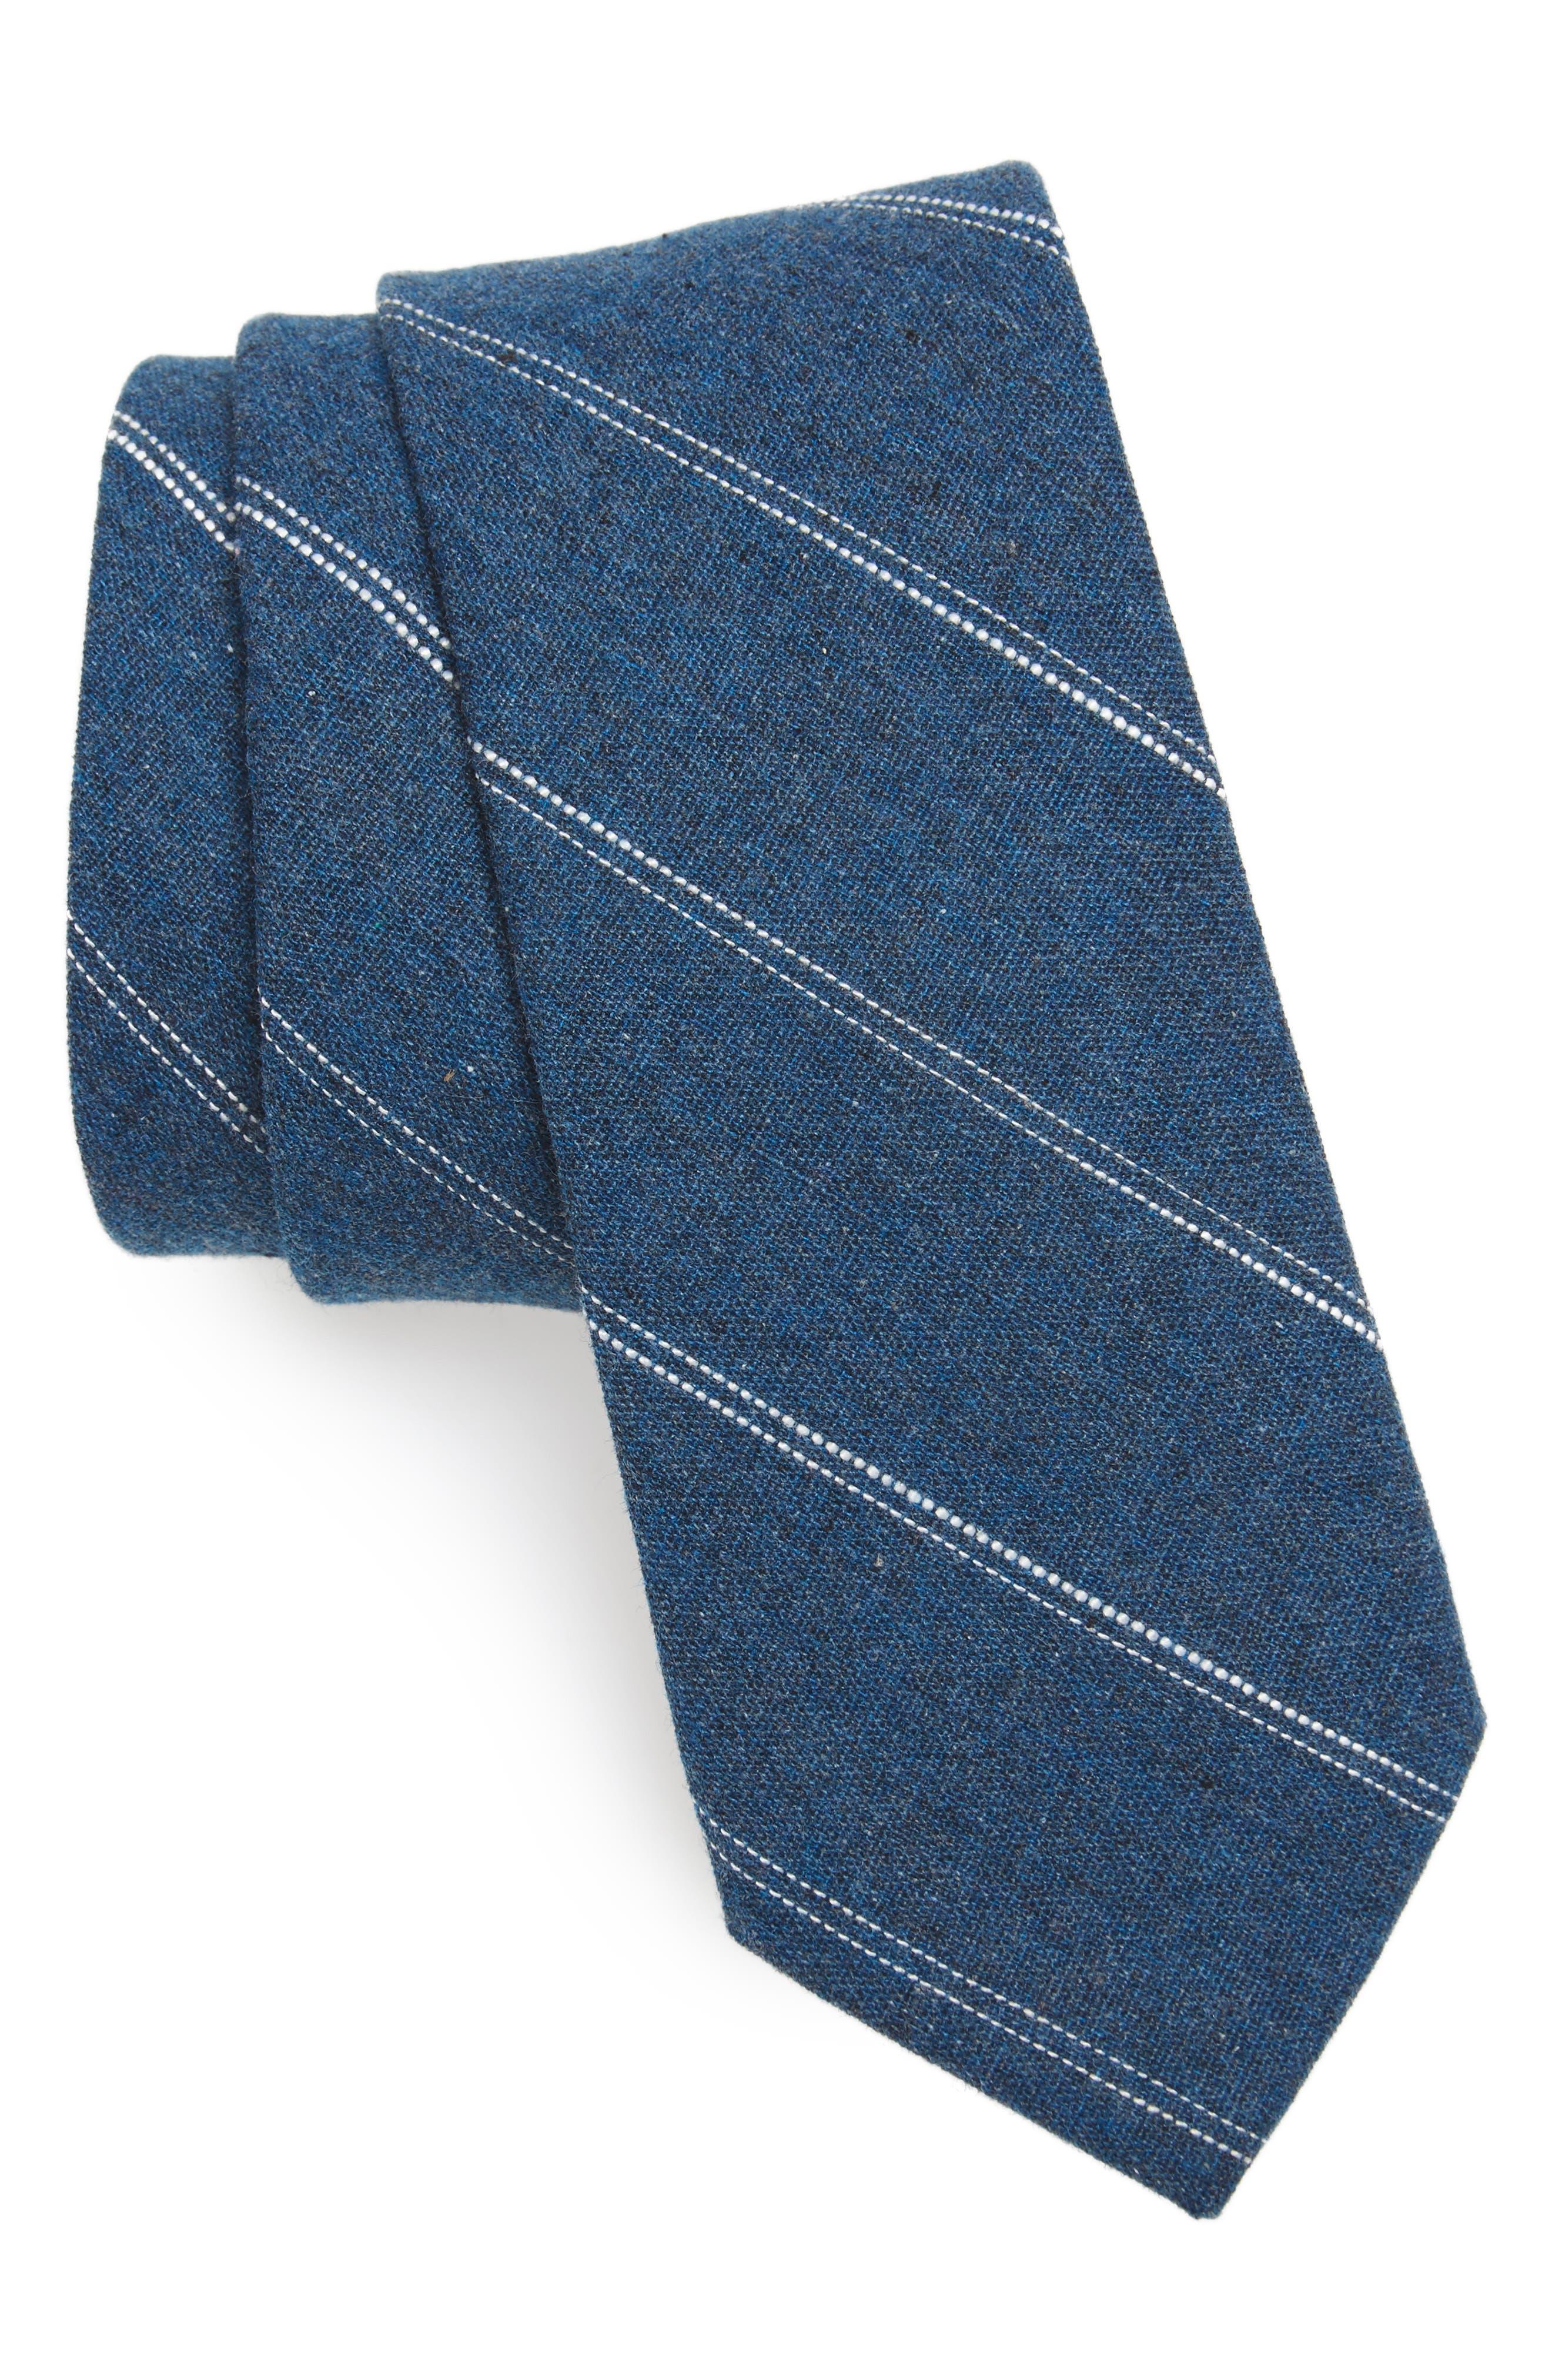 Main Image - Nordstrom Men's Shop Palamino Stripe Cotton & Linen Skinny Tie